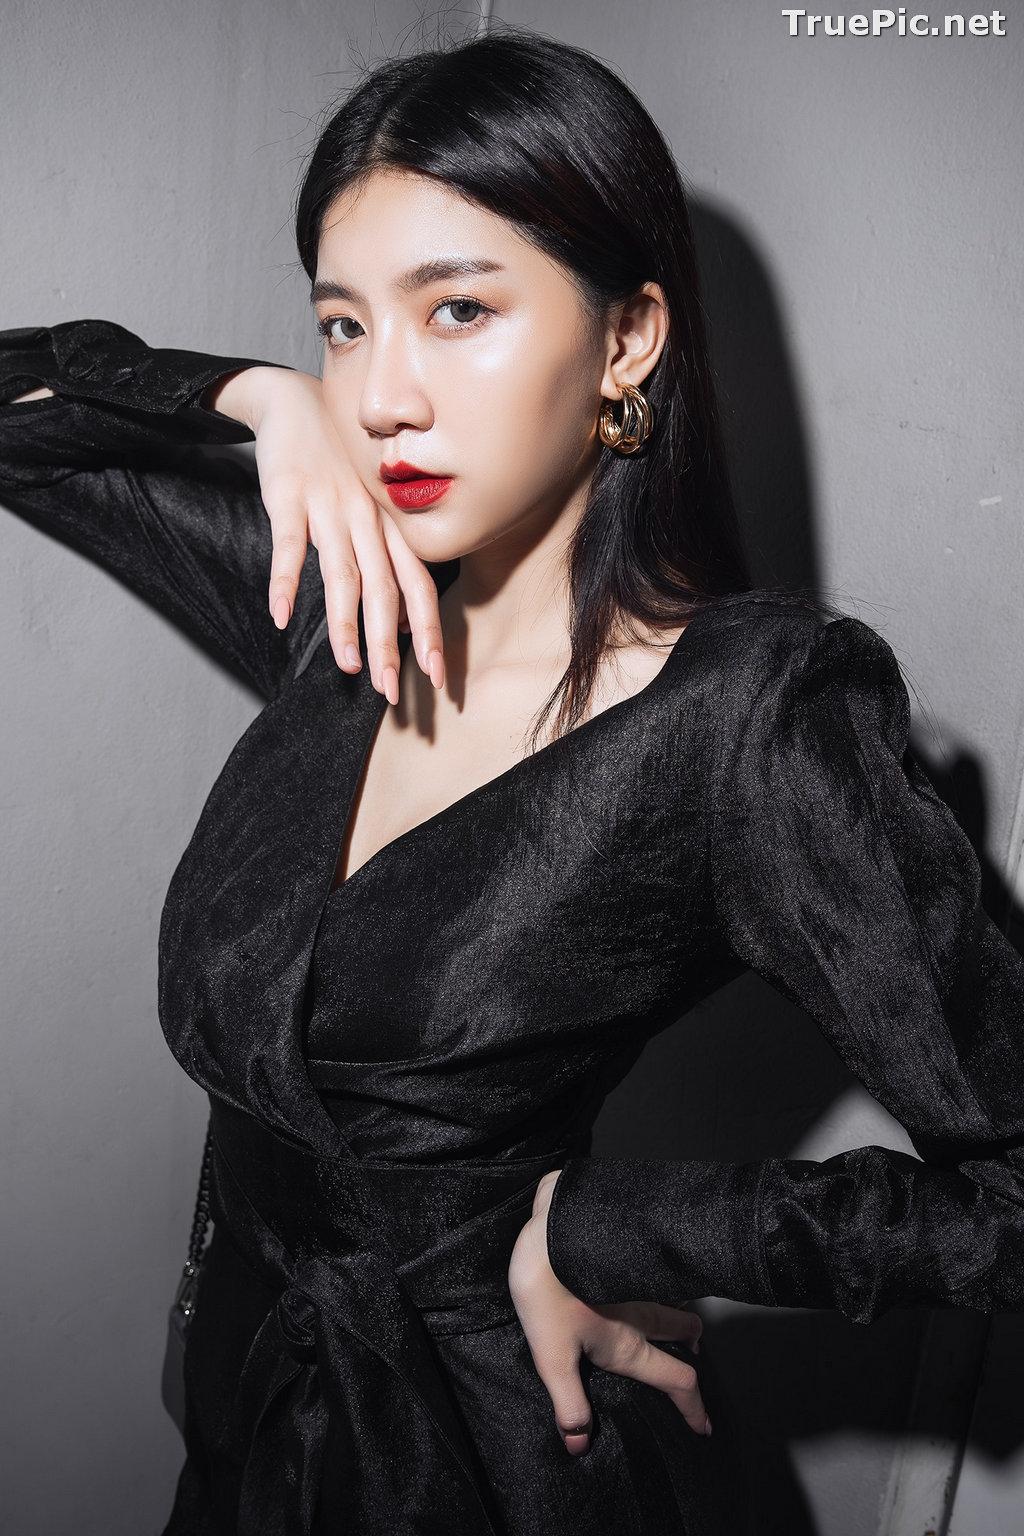 Image Thailand Model - Sasi Ngiunwan - Black For SiamNight - TruePic.net - Picture-6